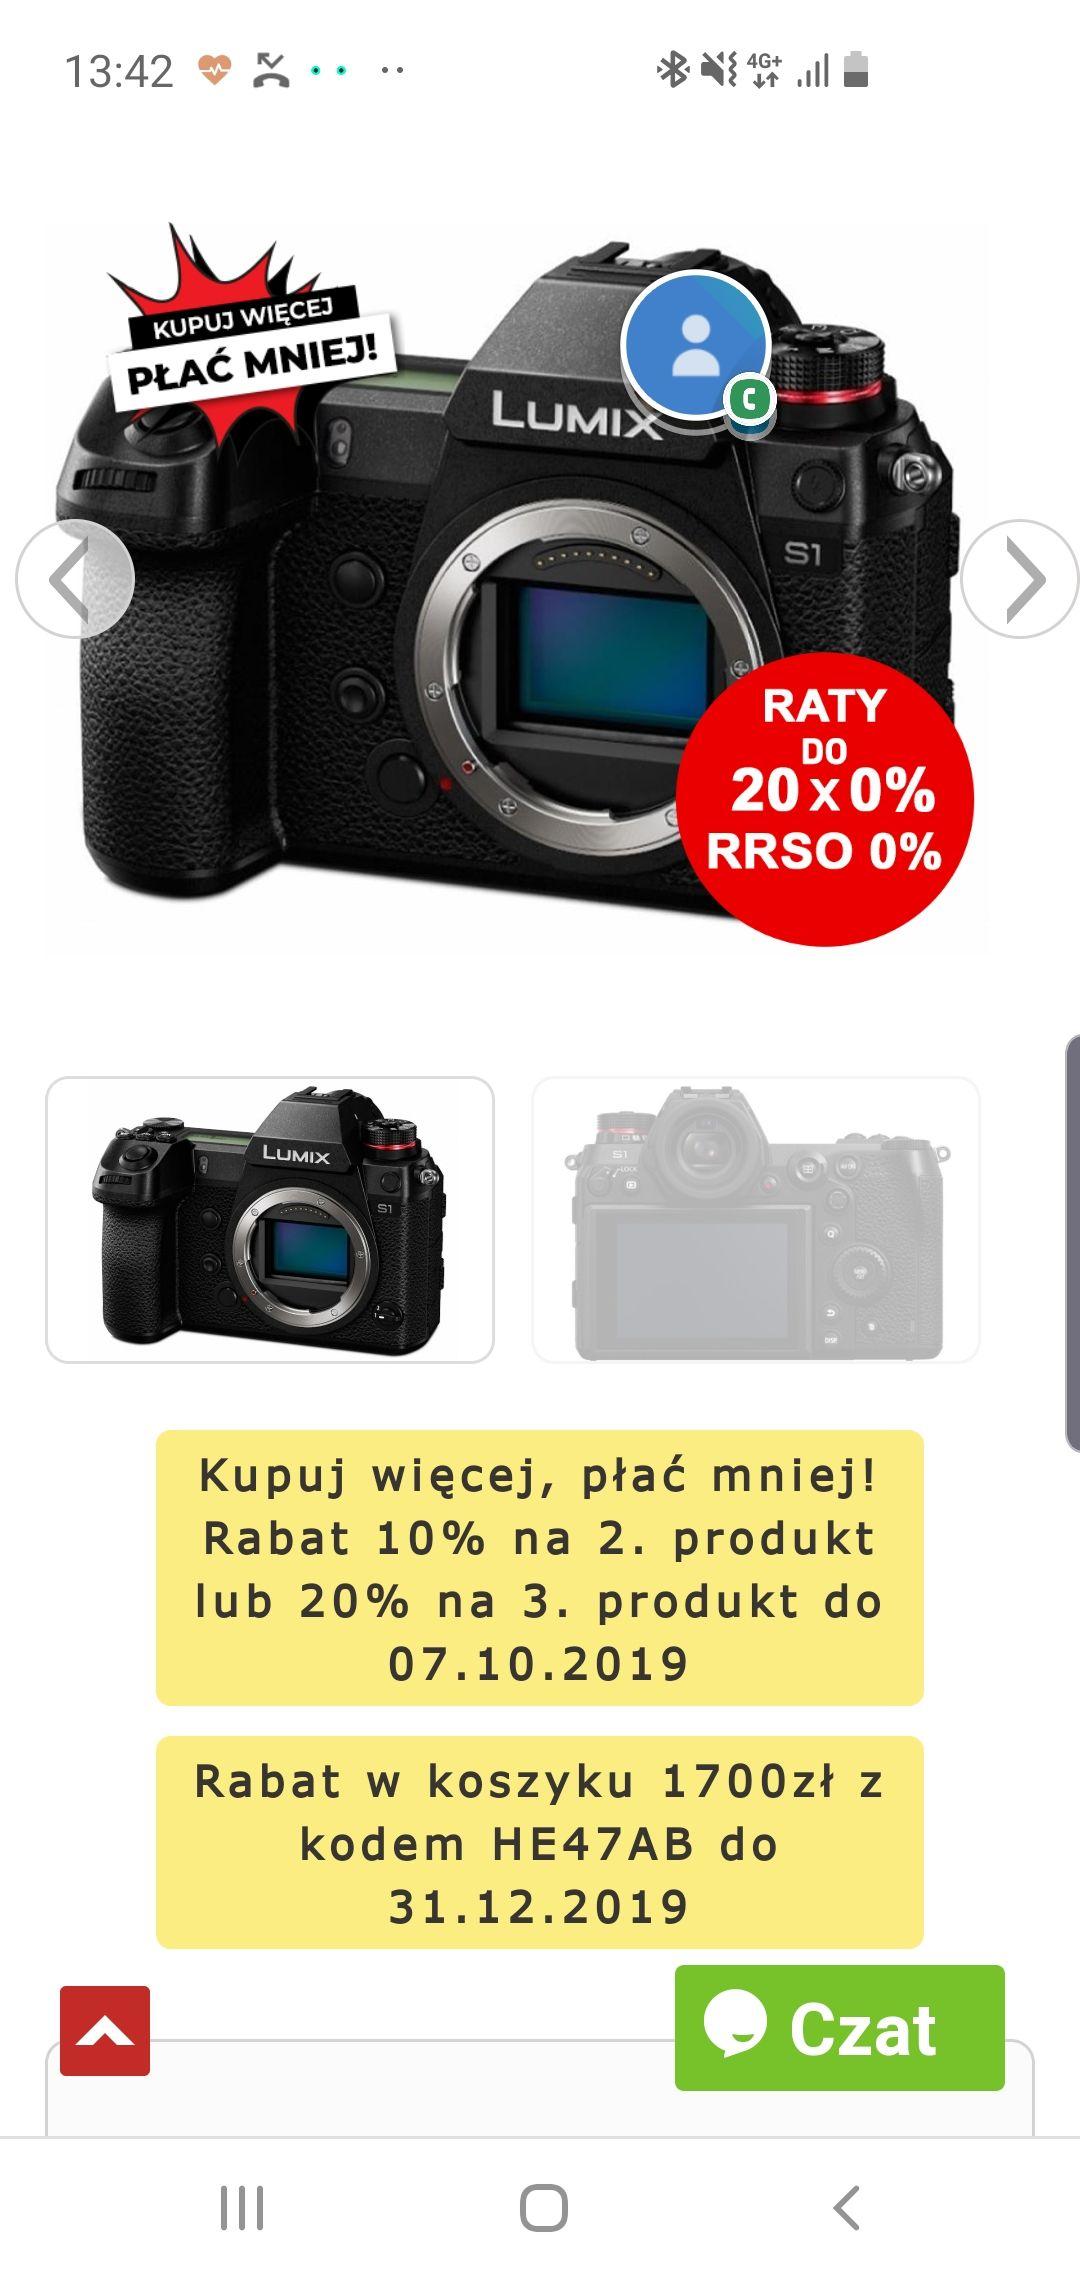 Aparat Panasonic Lumix S1